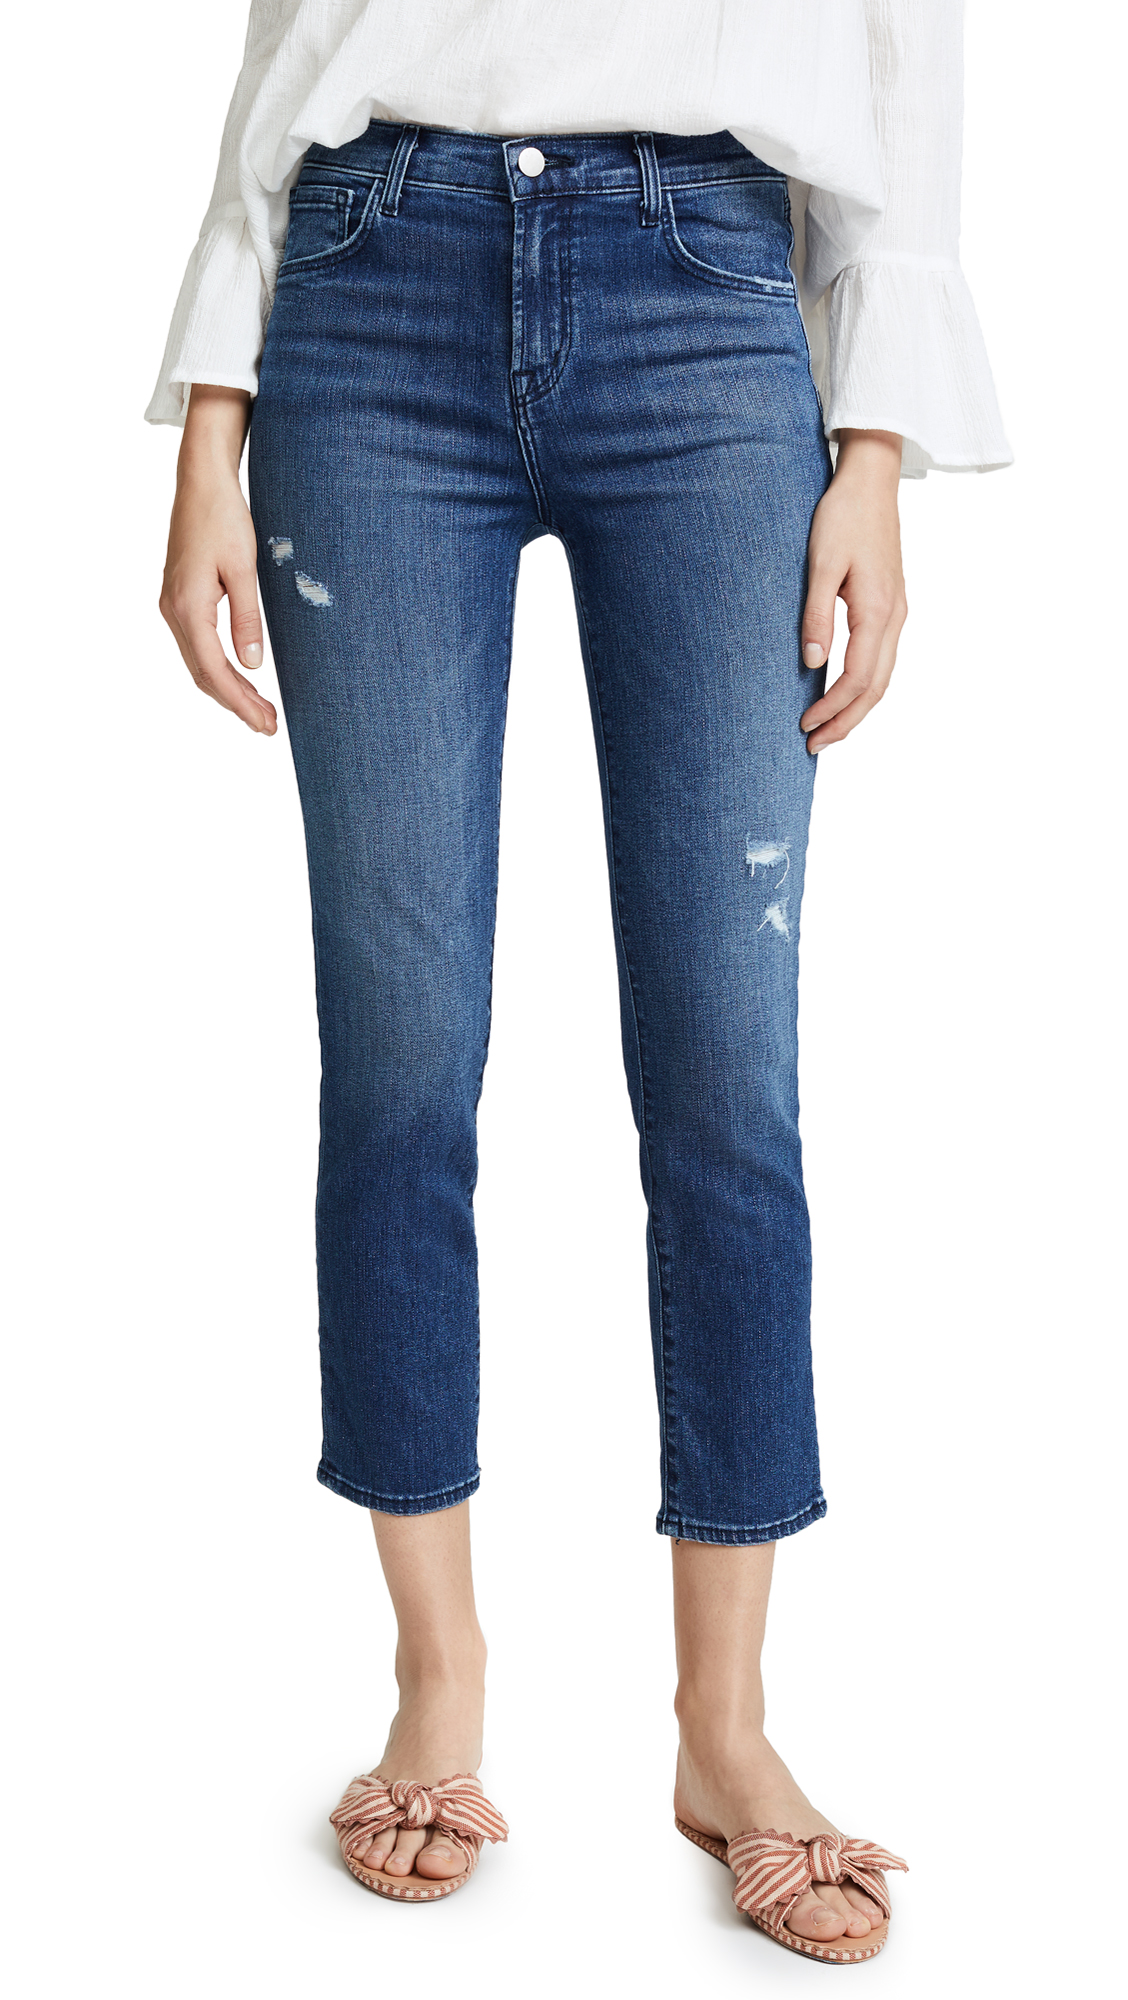 J Brand Ruby Crop Jeans In Mystic